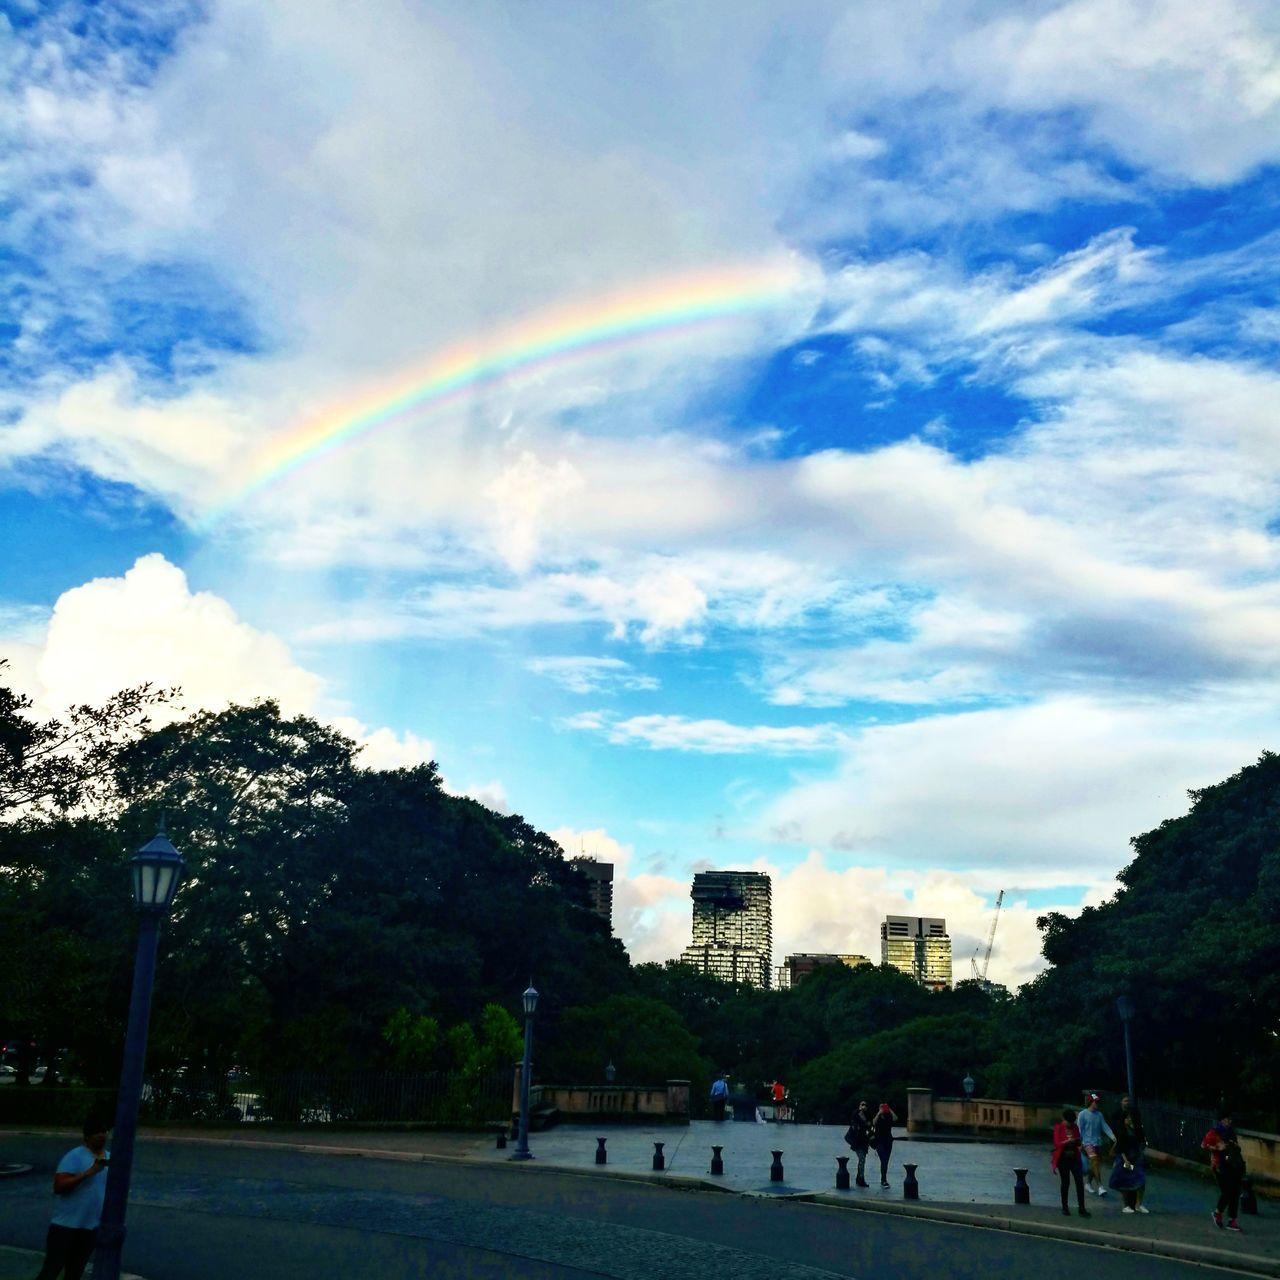 Rainbow🌈 Cloud - Sky Rainbow Beauty In Nature God Is The Greatest Artist. Nature Photography